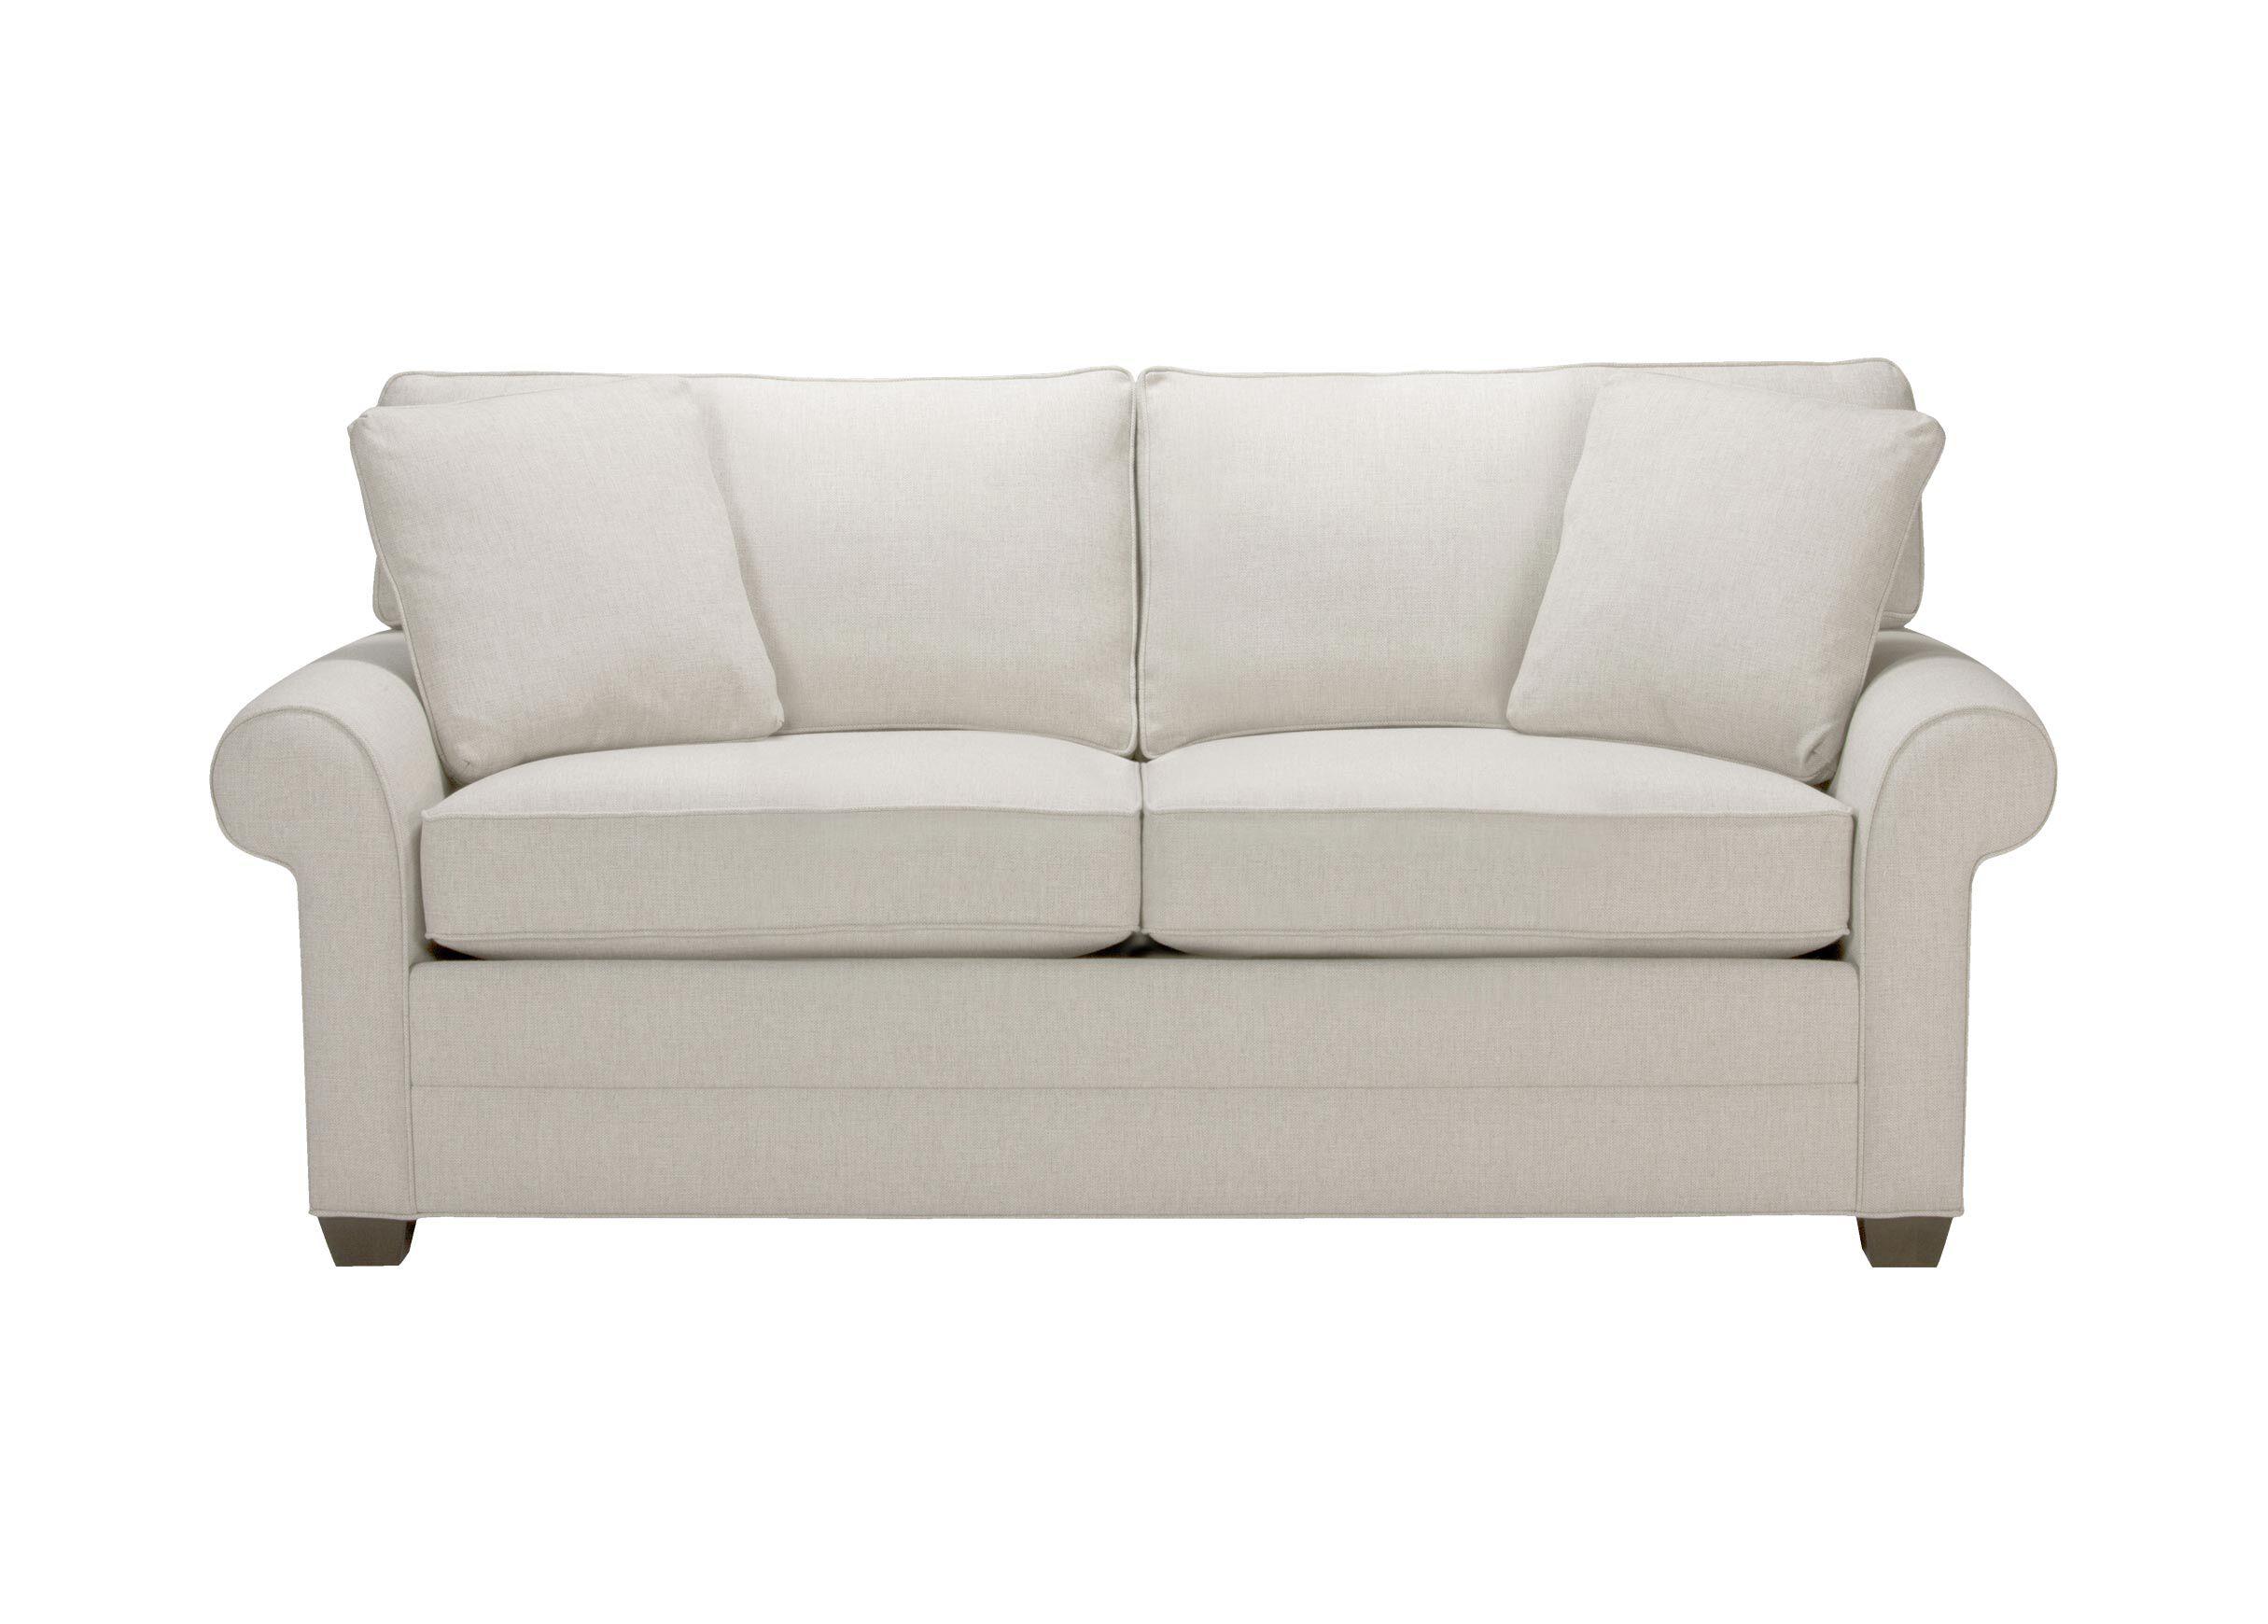 roll arm sofa canada imea bennett quick ship sofas and loveseats